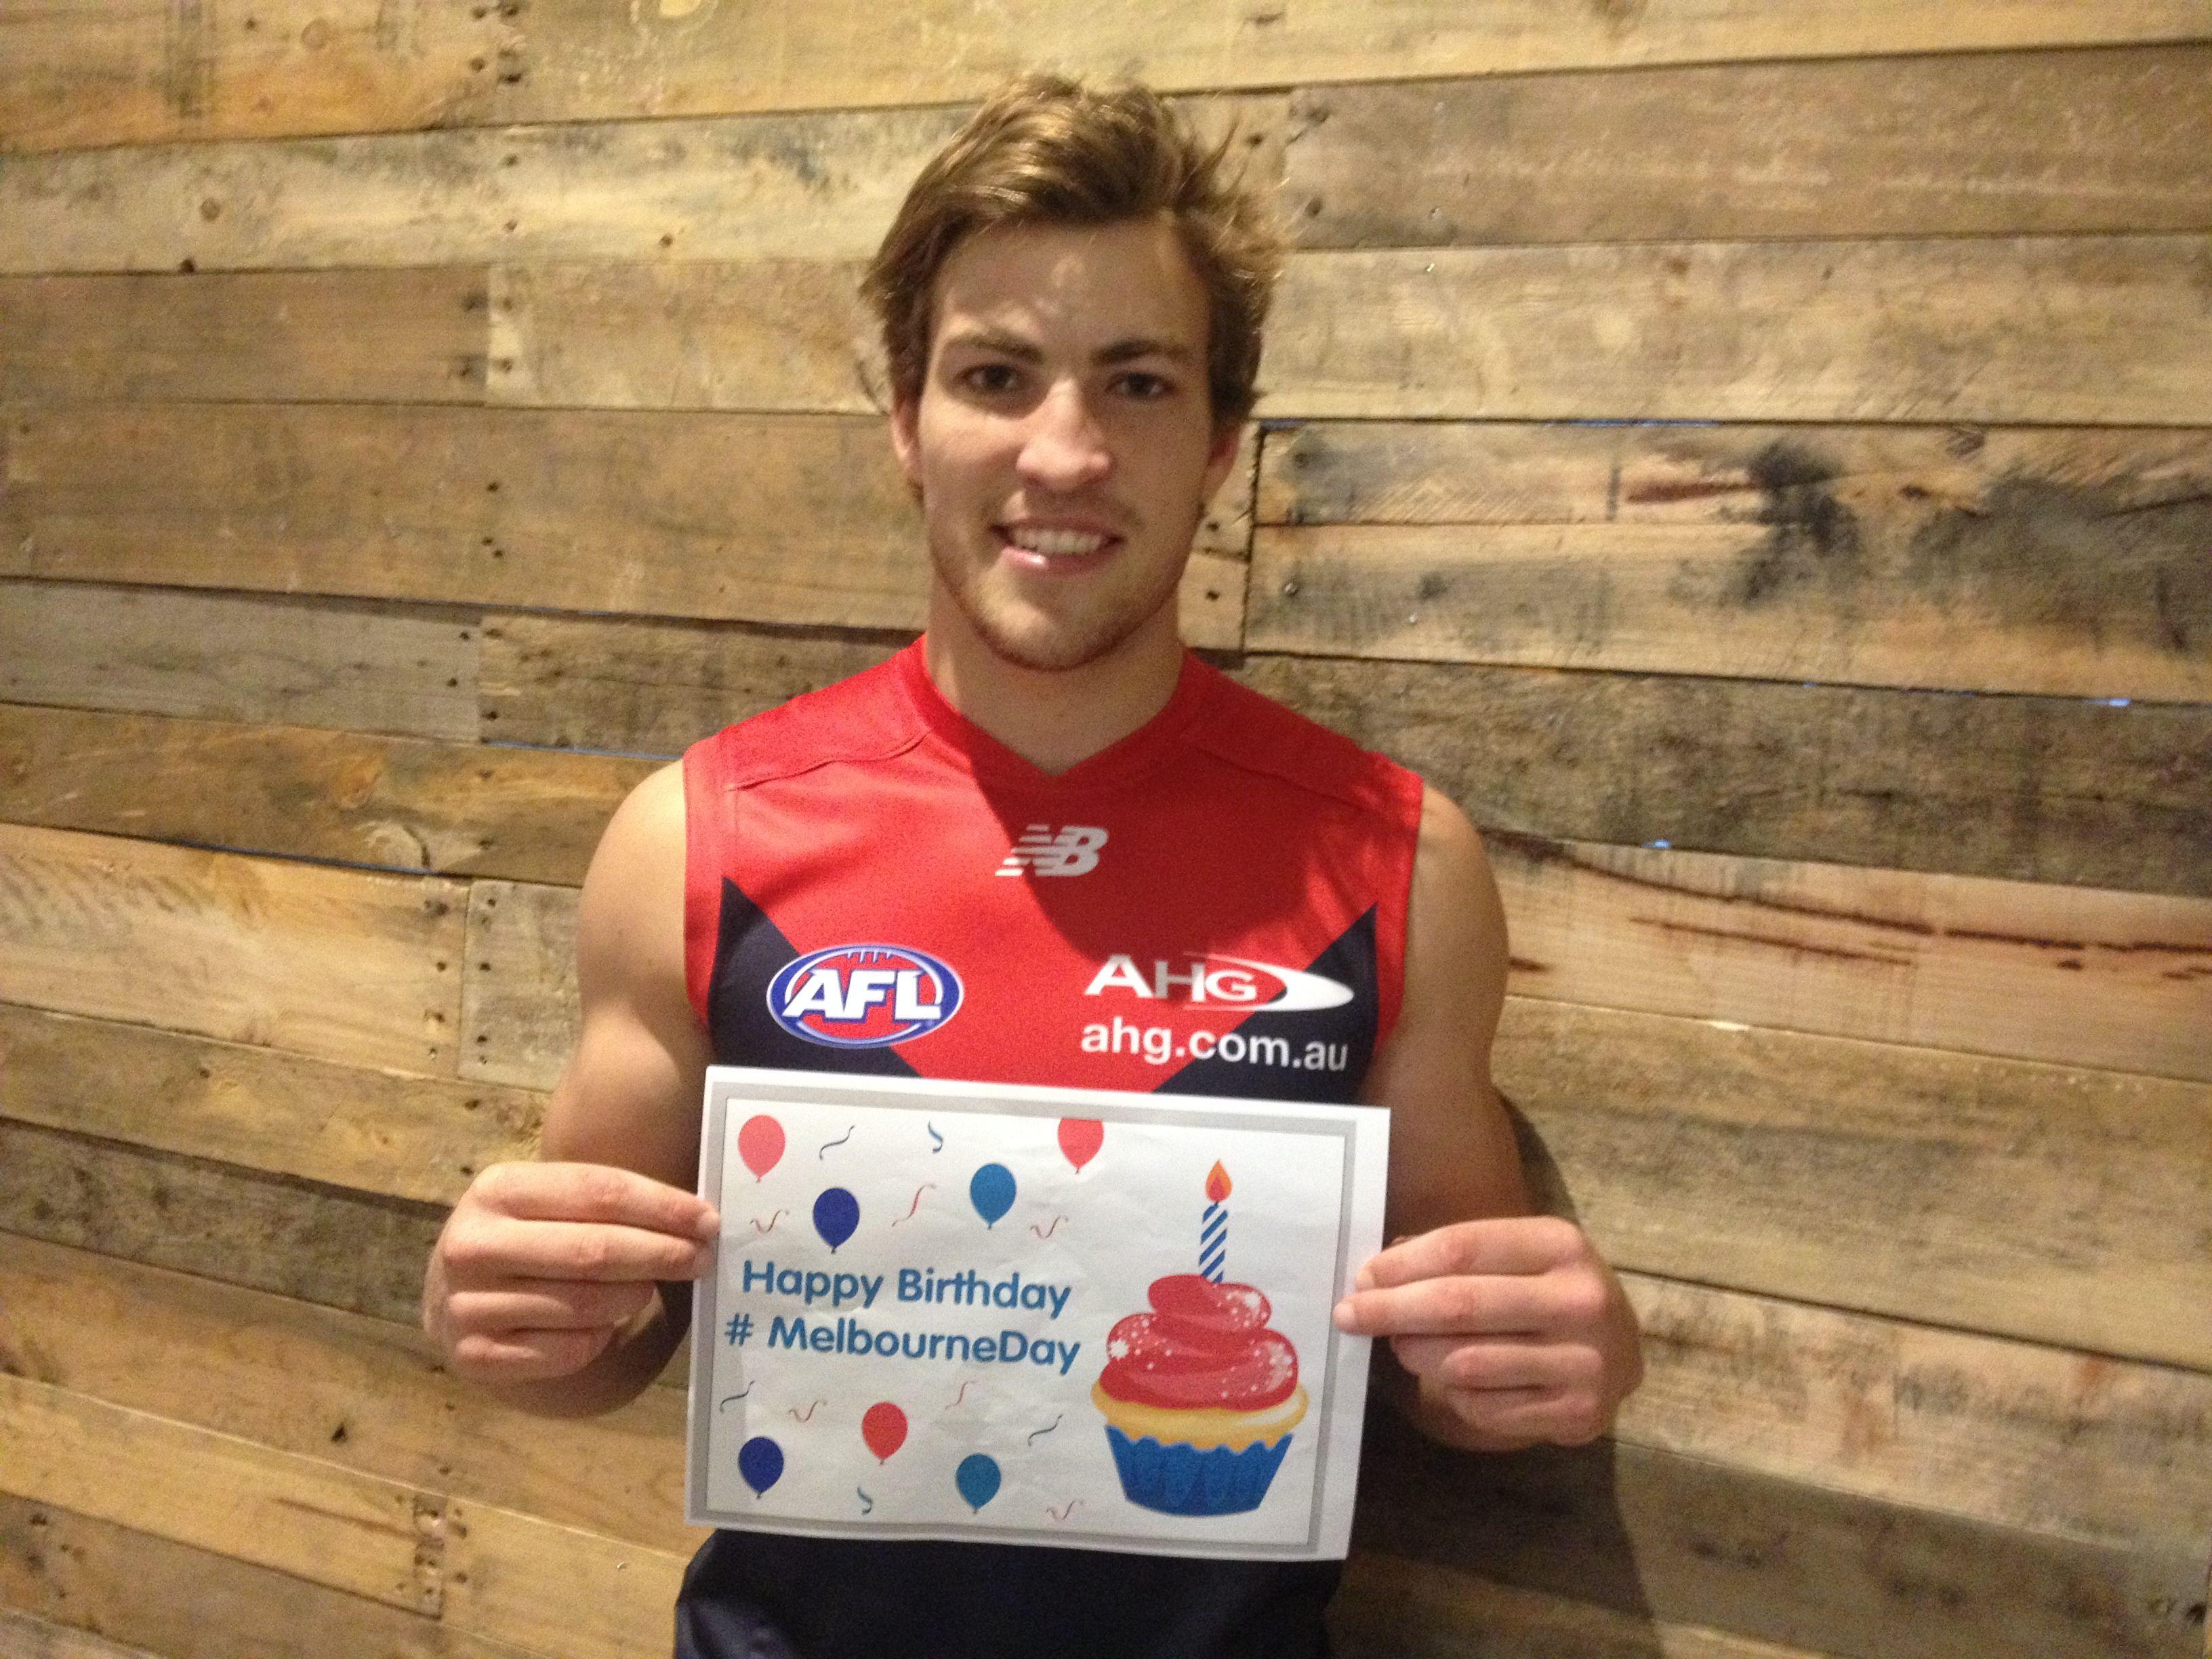 AFL Melbourne Football Club player Jack Viney.